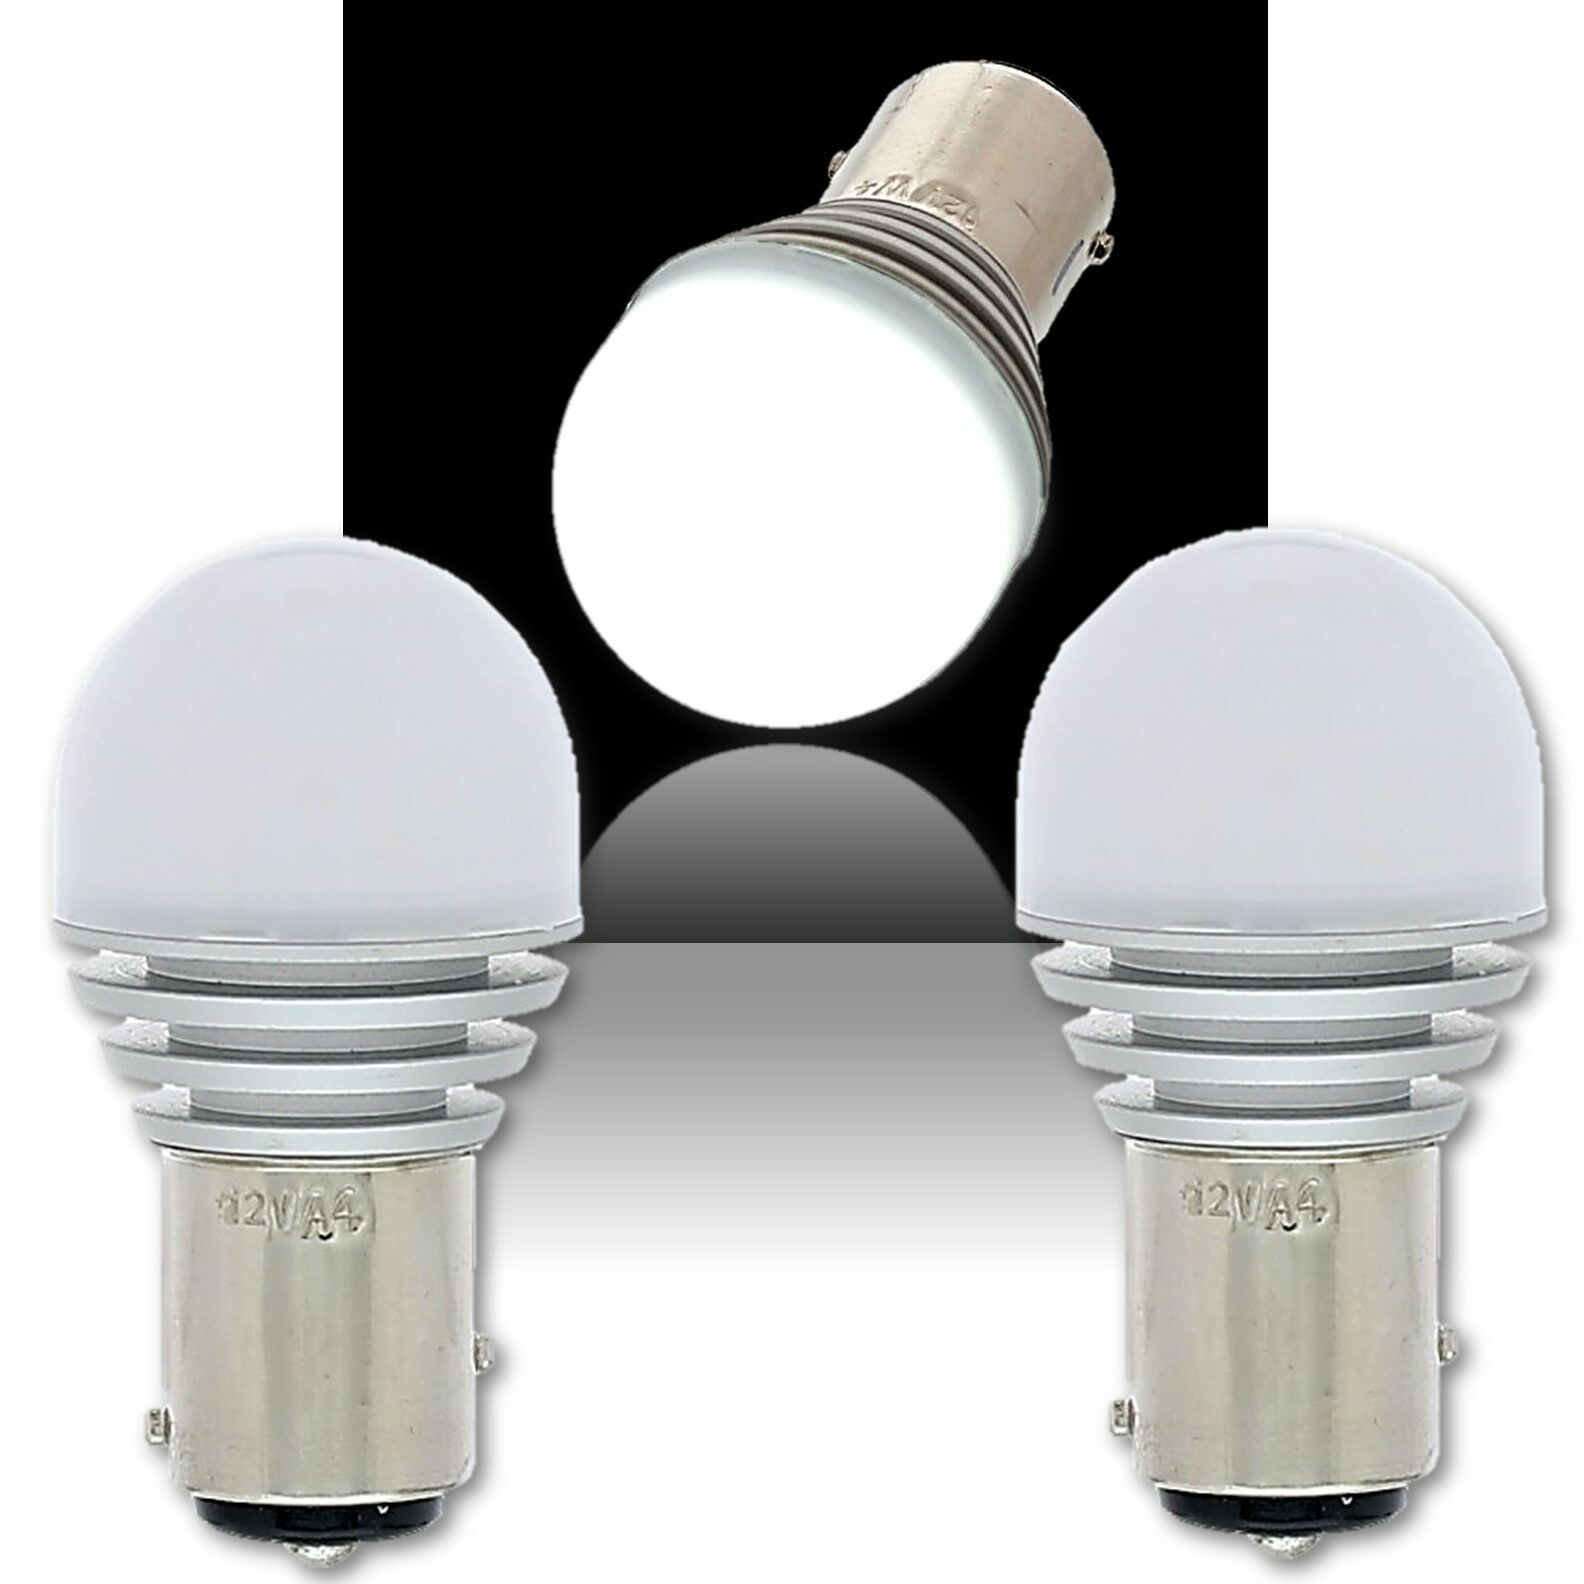 #1157 Amber LED 12V Park Tail Light Brake Stop Turn Signal Lamp Bulb Pair 7.3